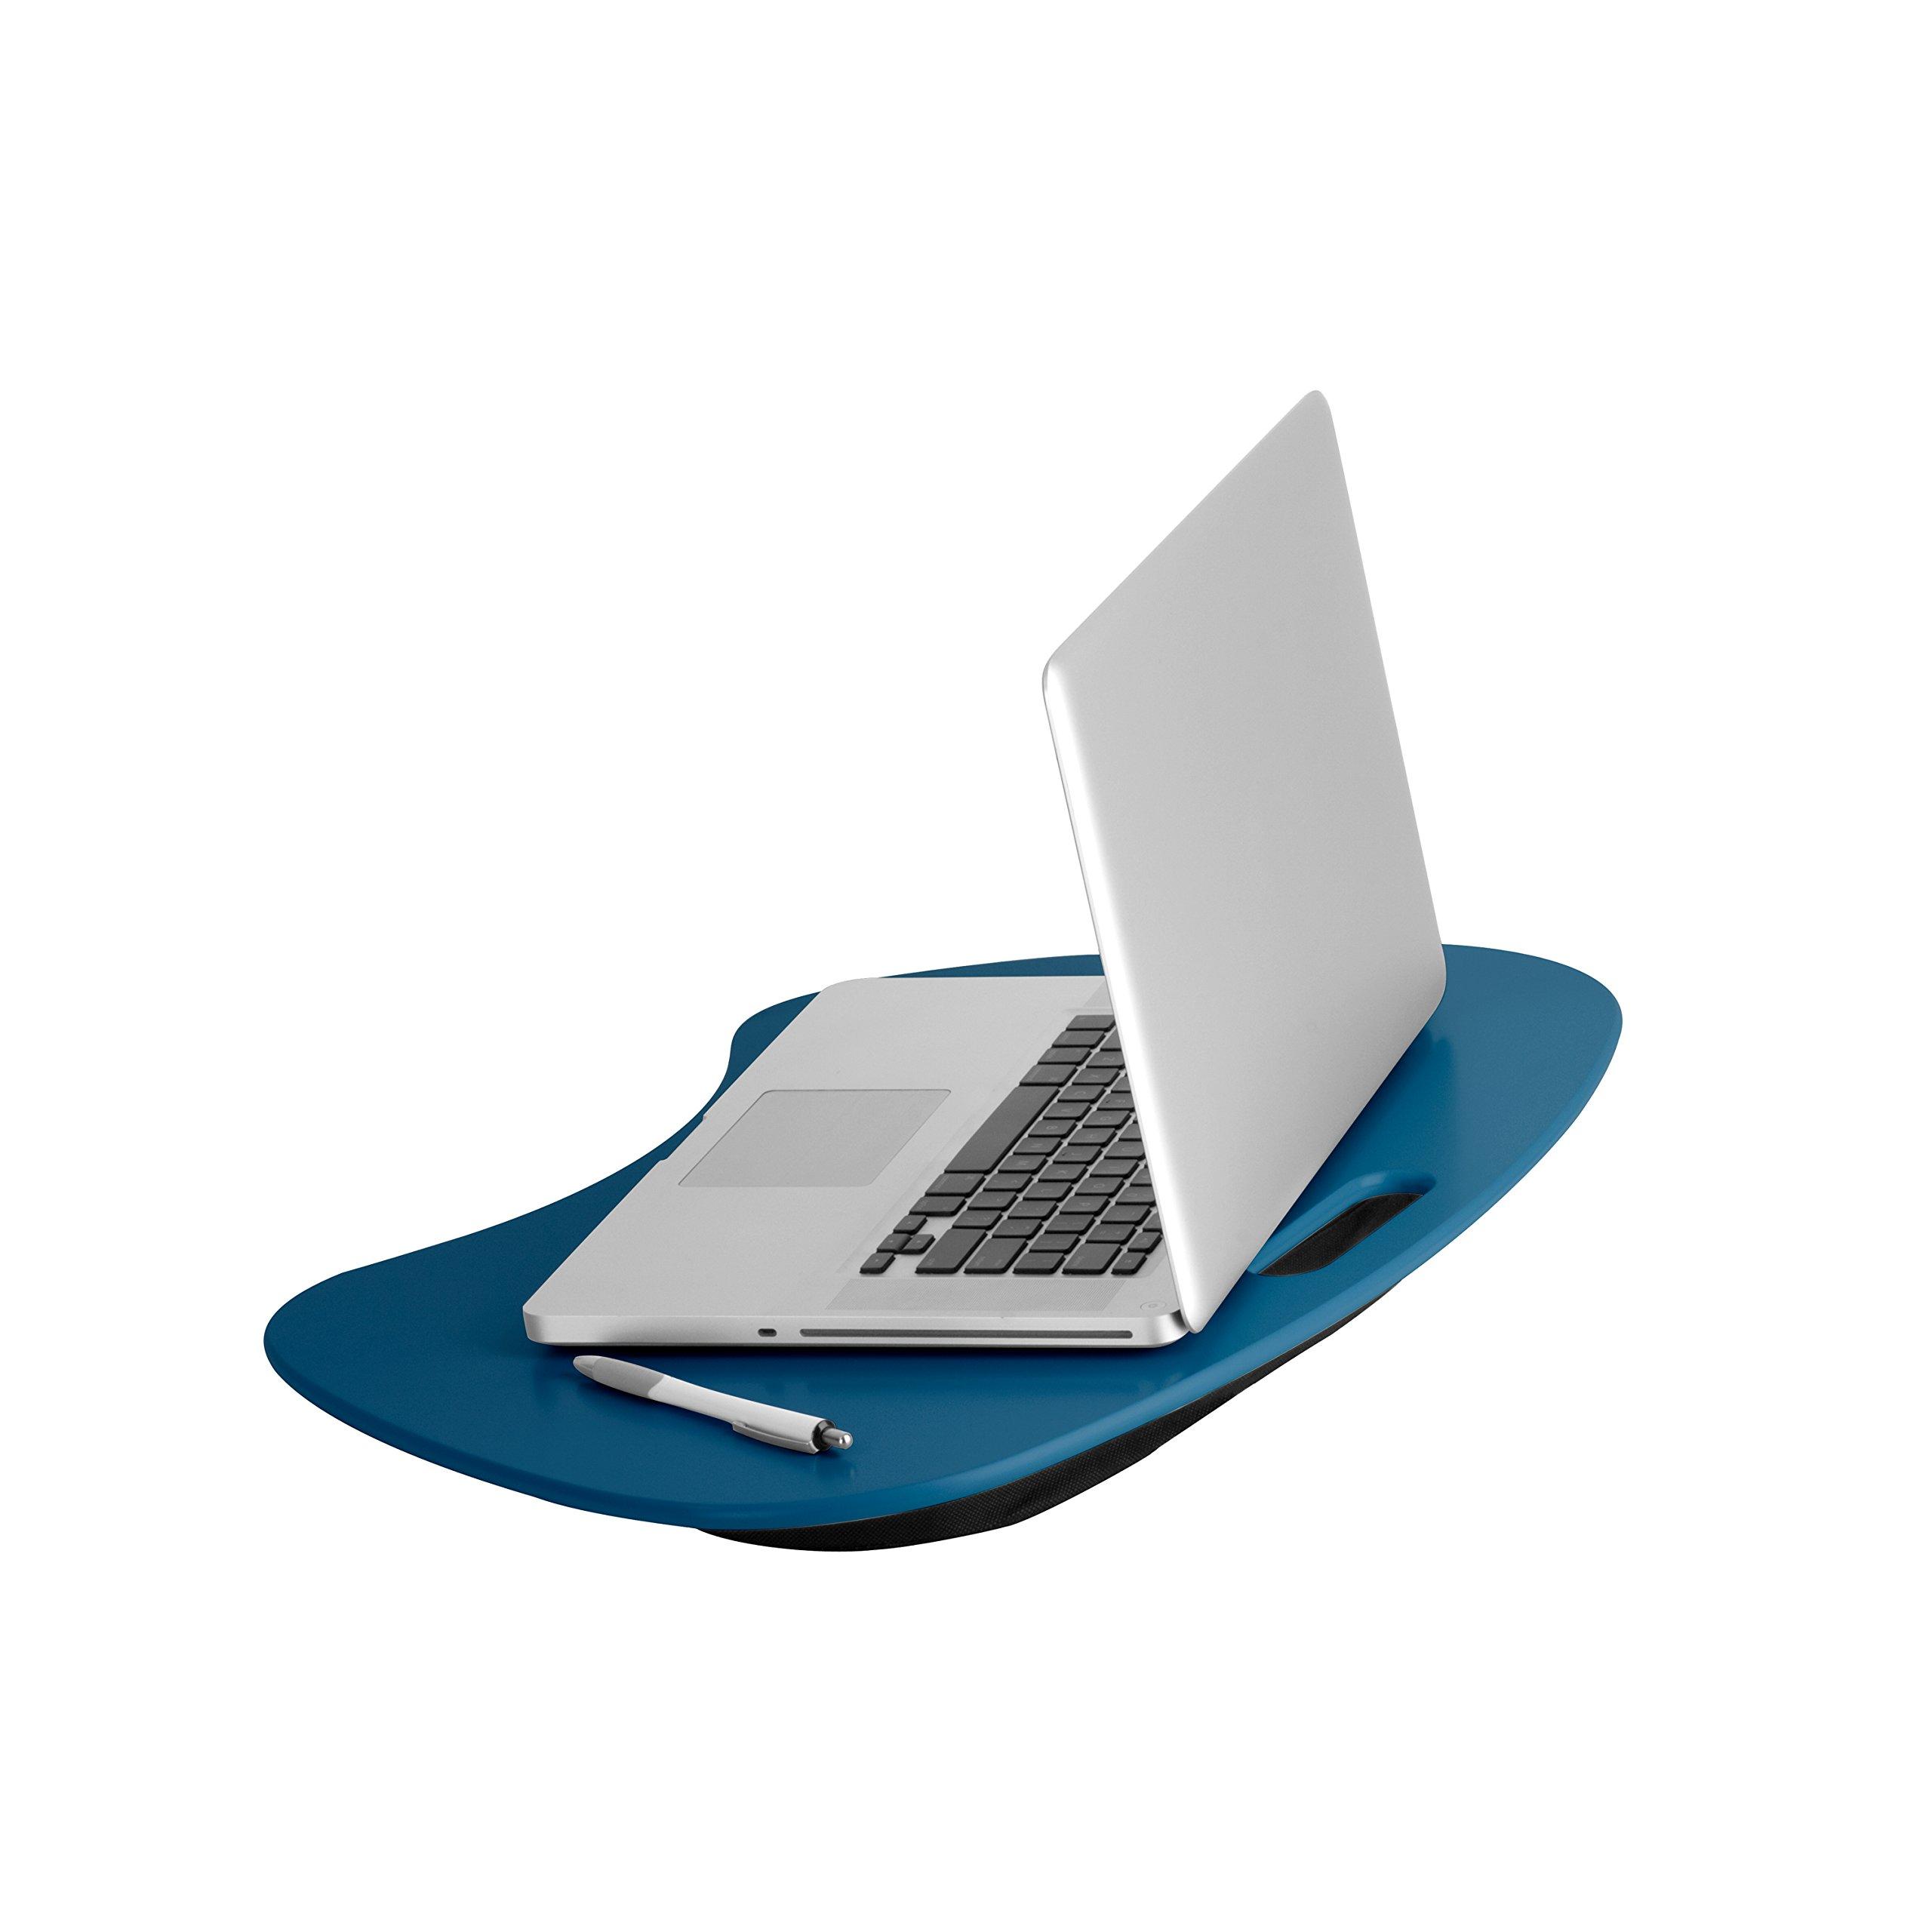 Honey-Can-Do TBL-06321 Portable Laptop Lap Desk with Handle, Indigo Blue, 23 L x 16 W x 2.5 H